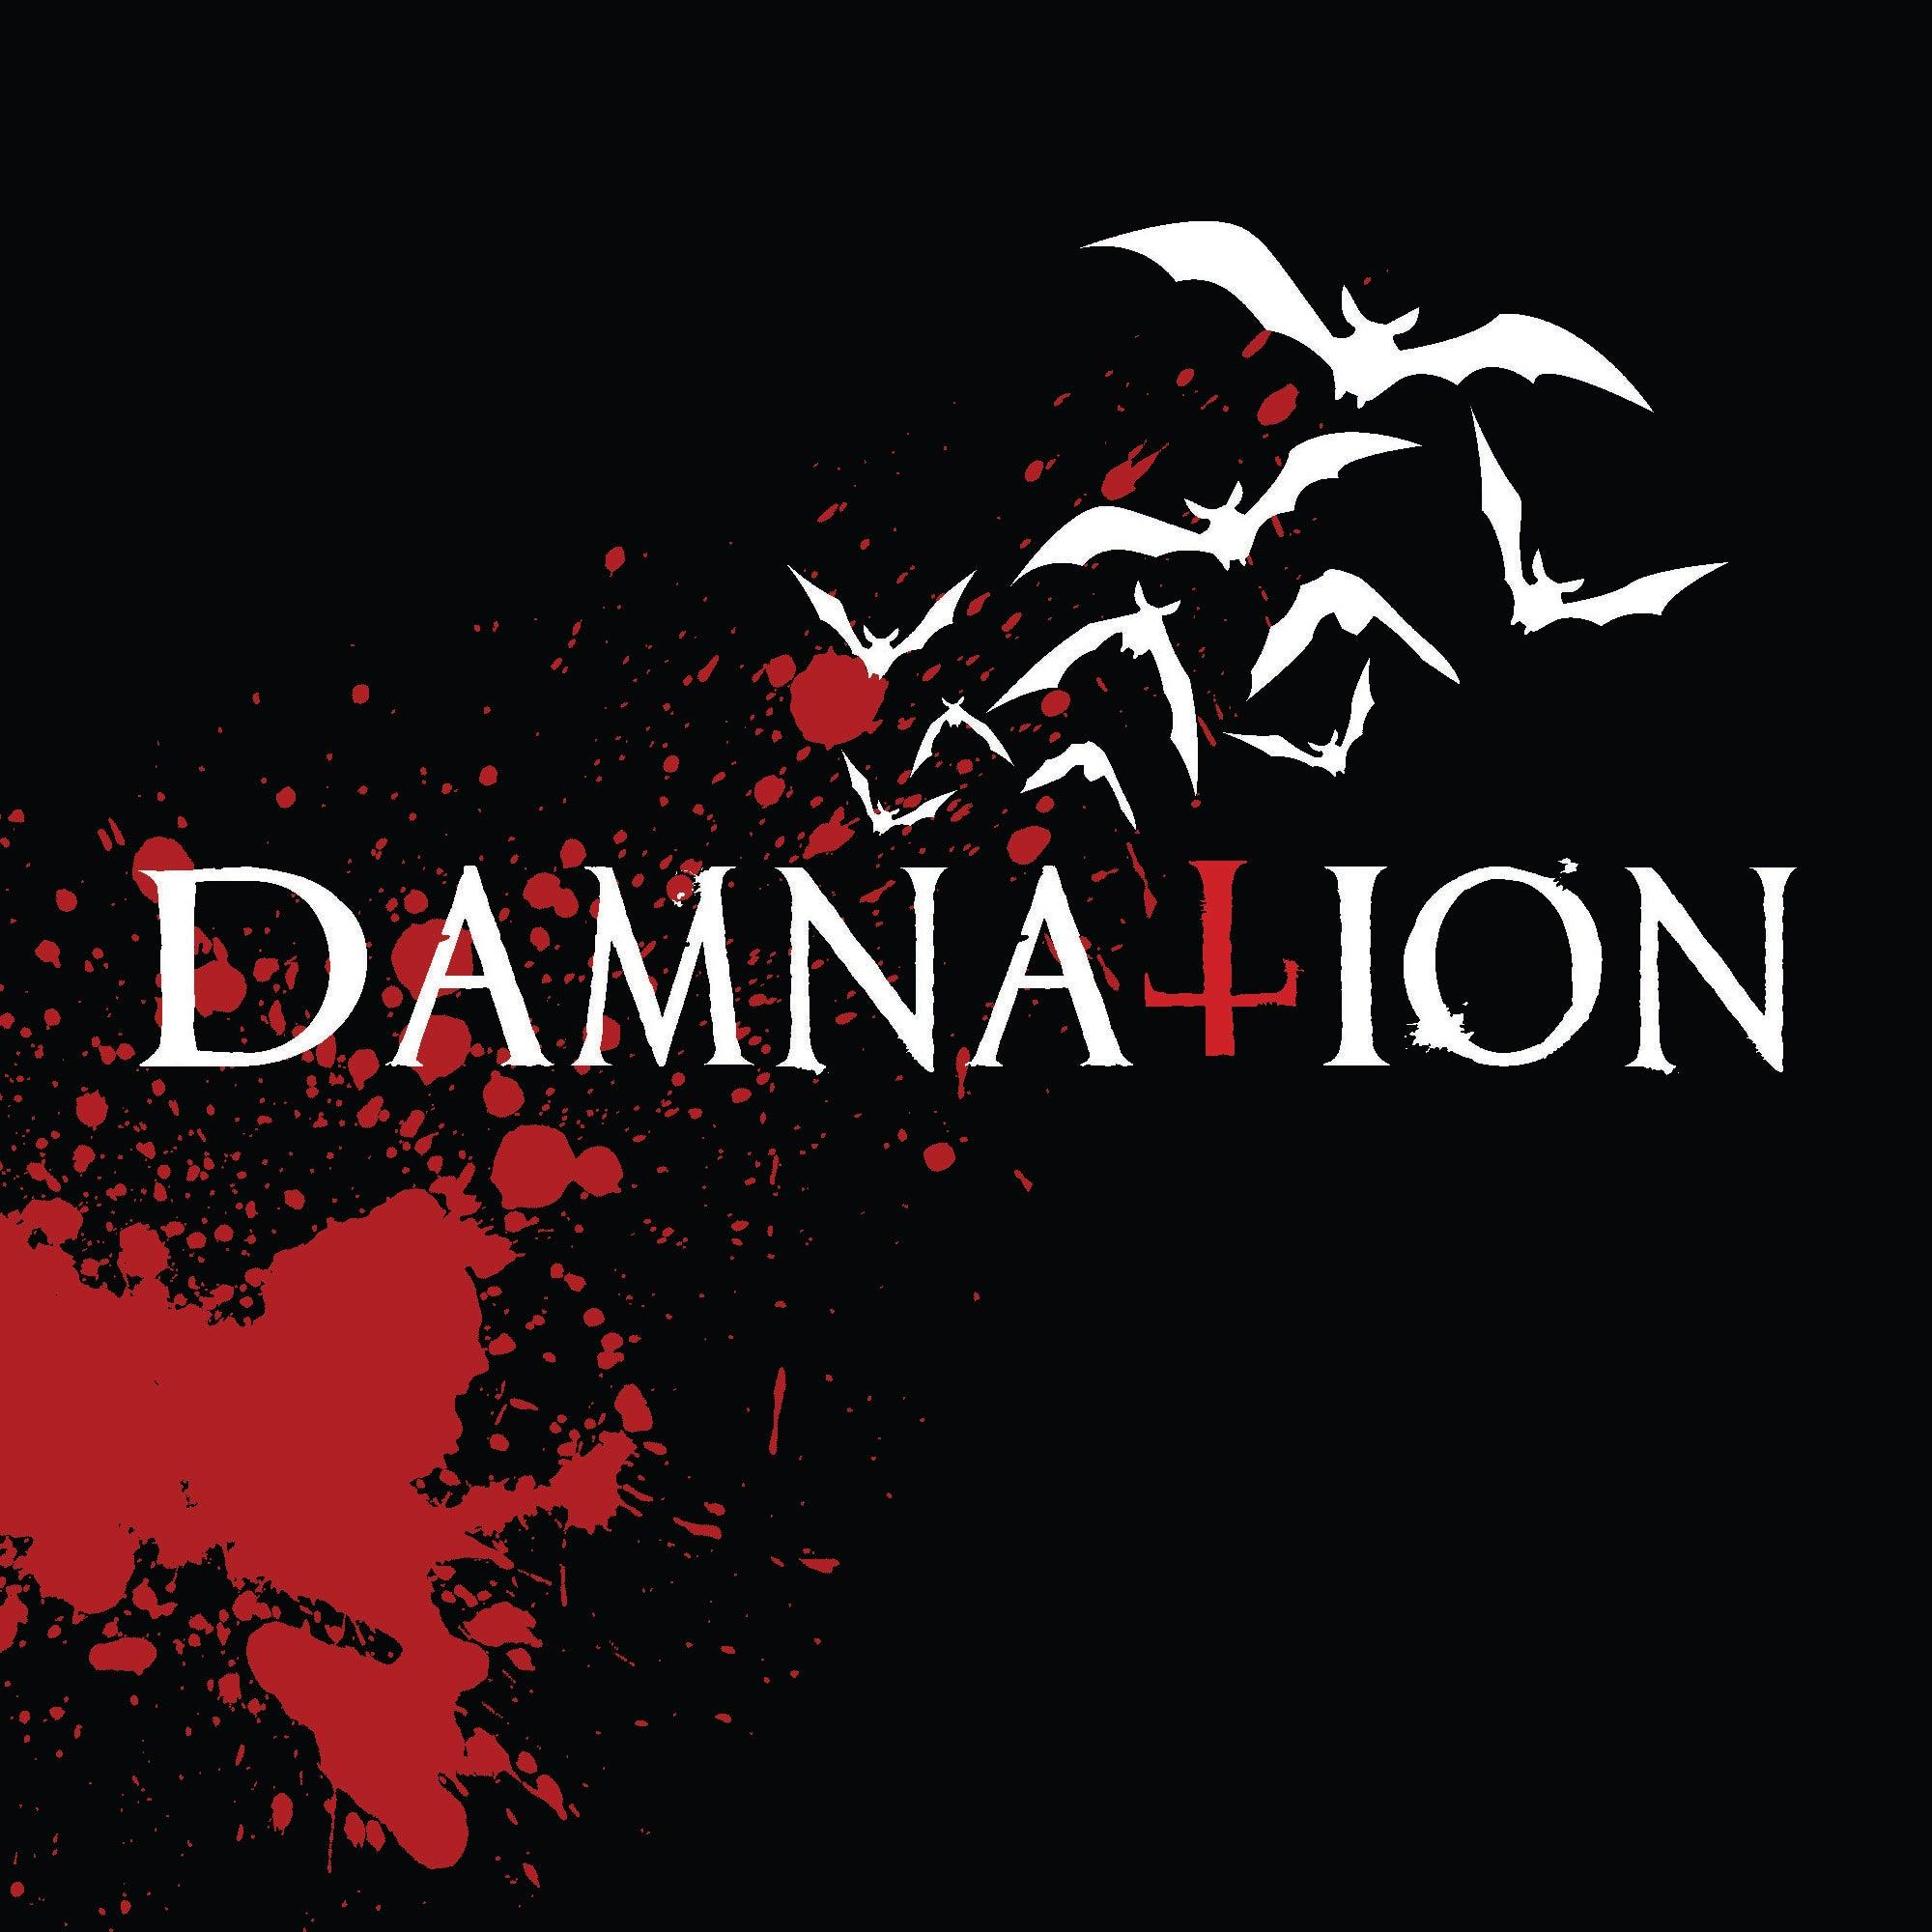 Damnationpunk